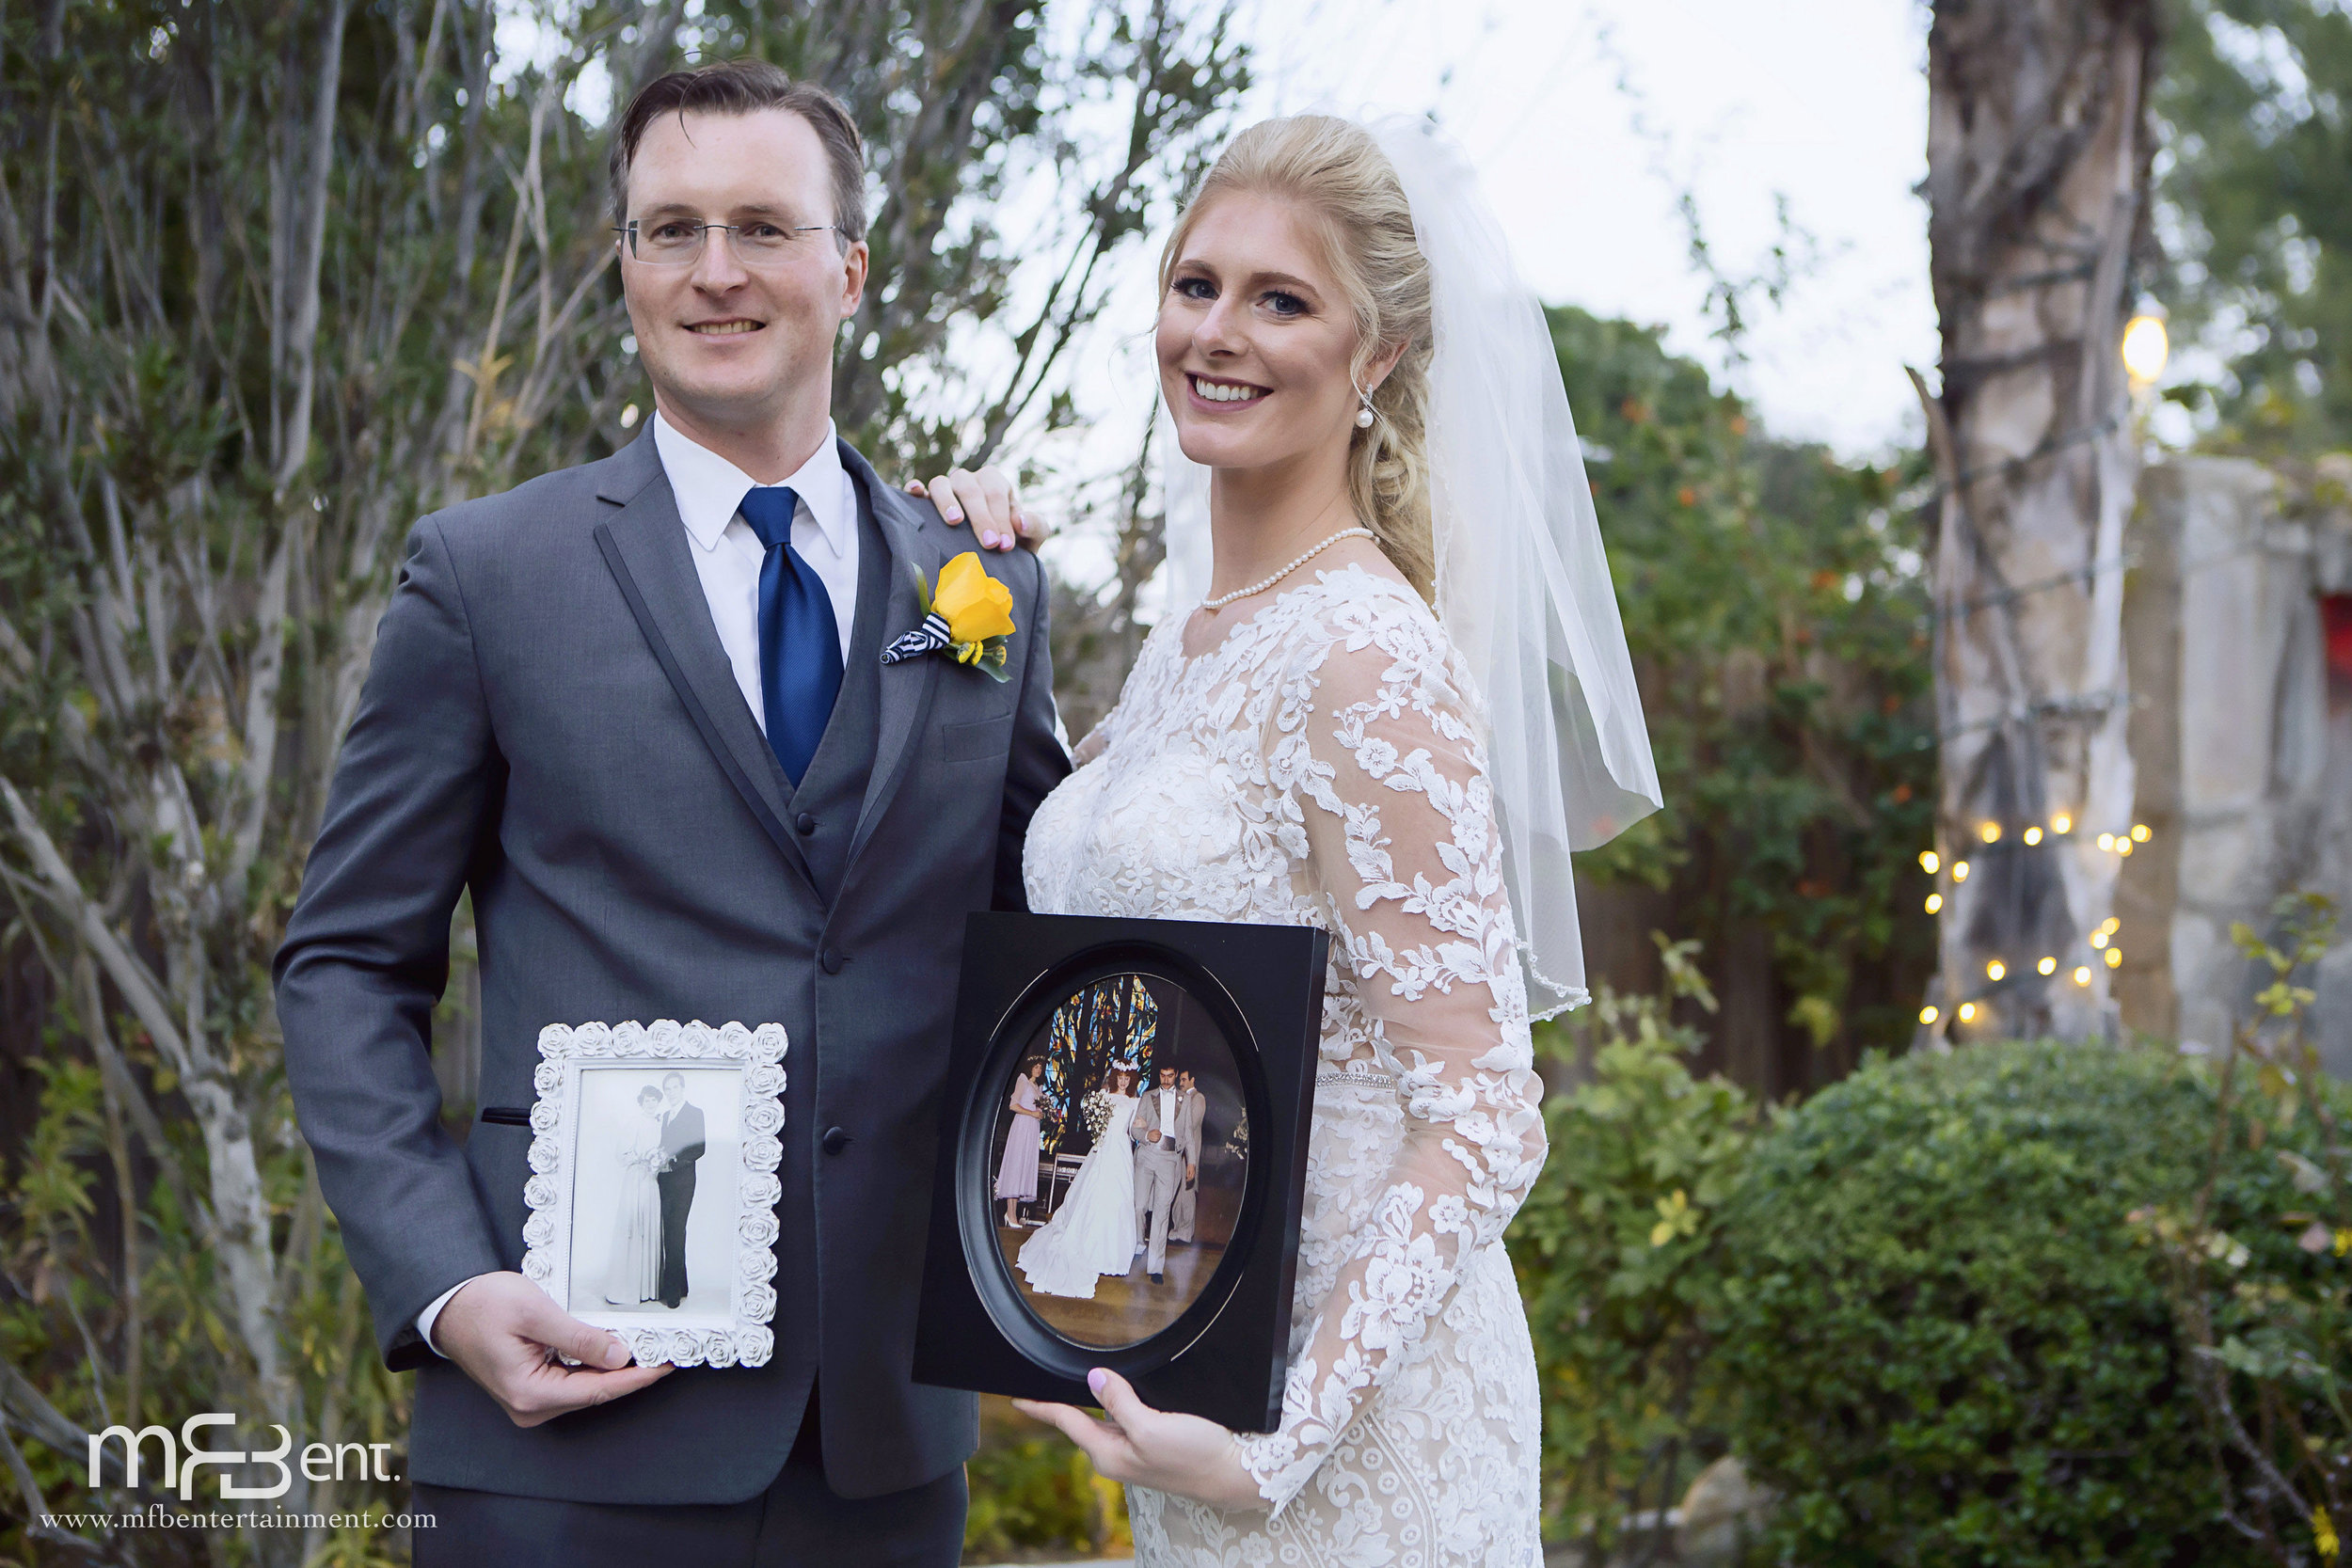 PIOTR CHELSEA WEDDING-PHOTO SESSION-0015 L.jpg